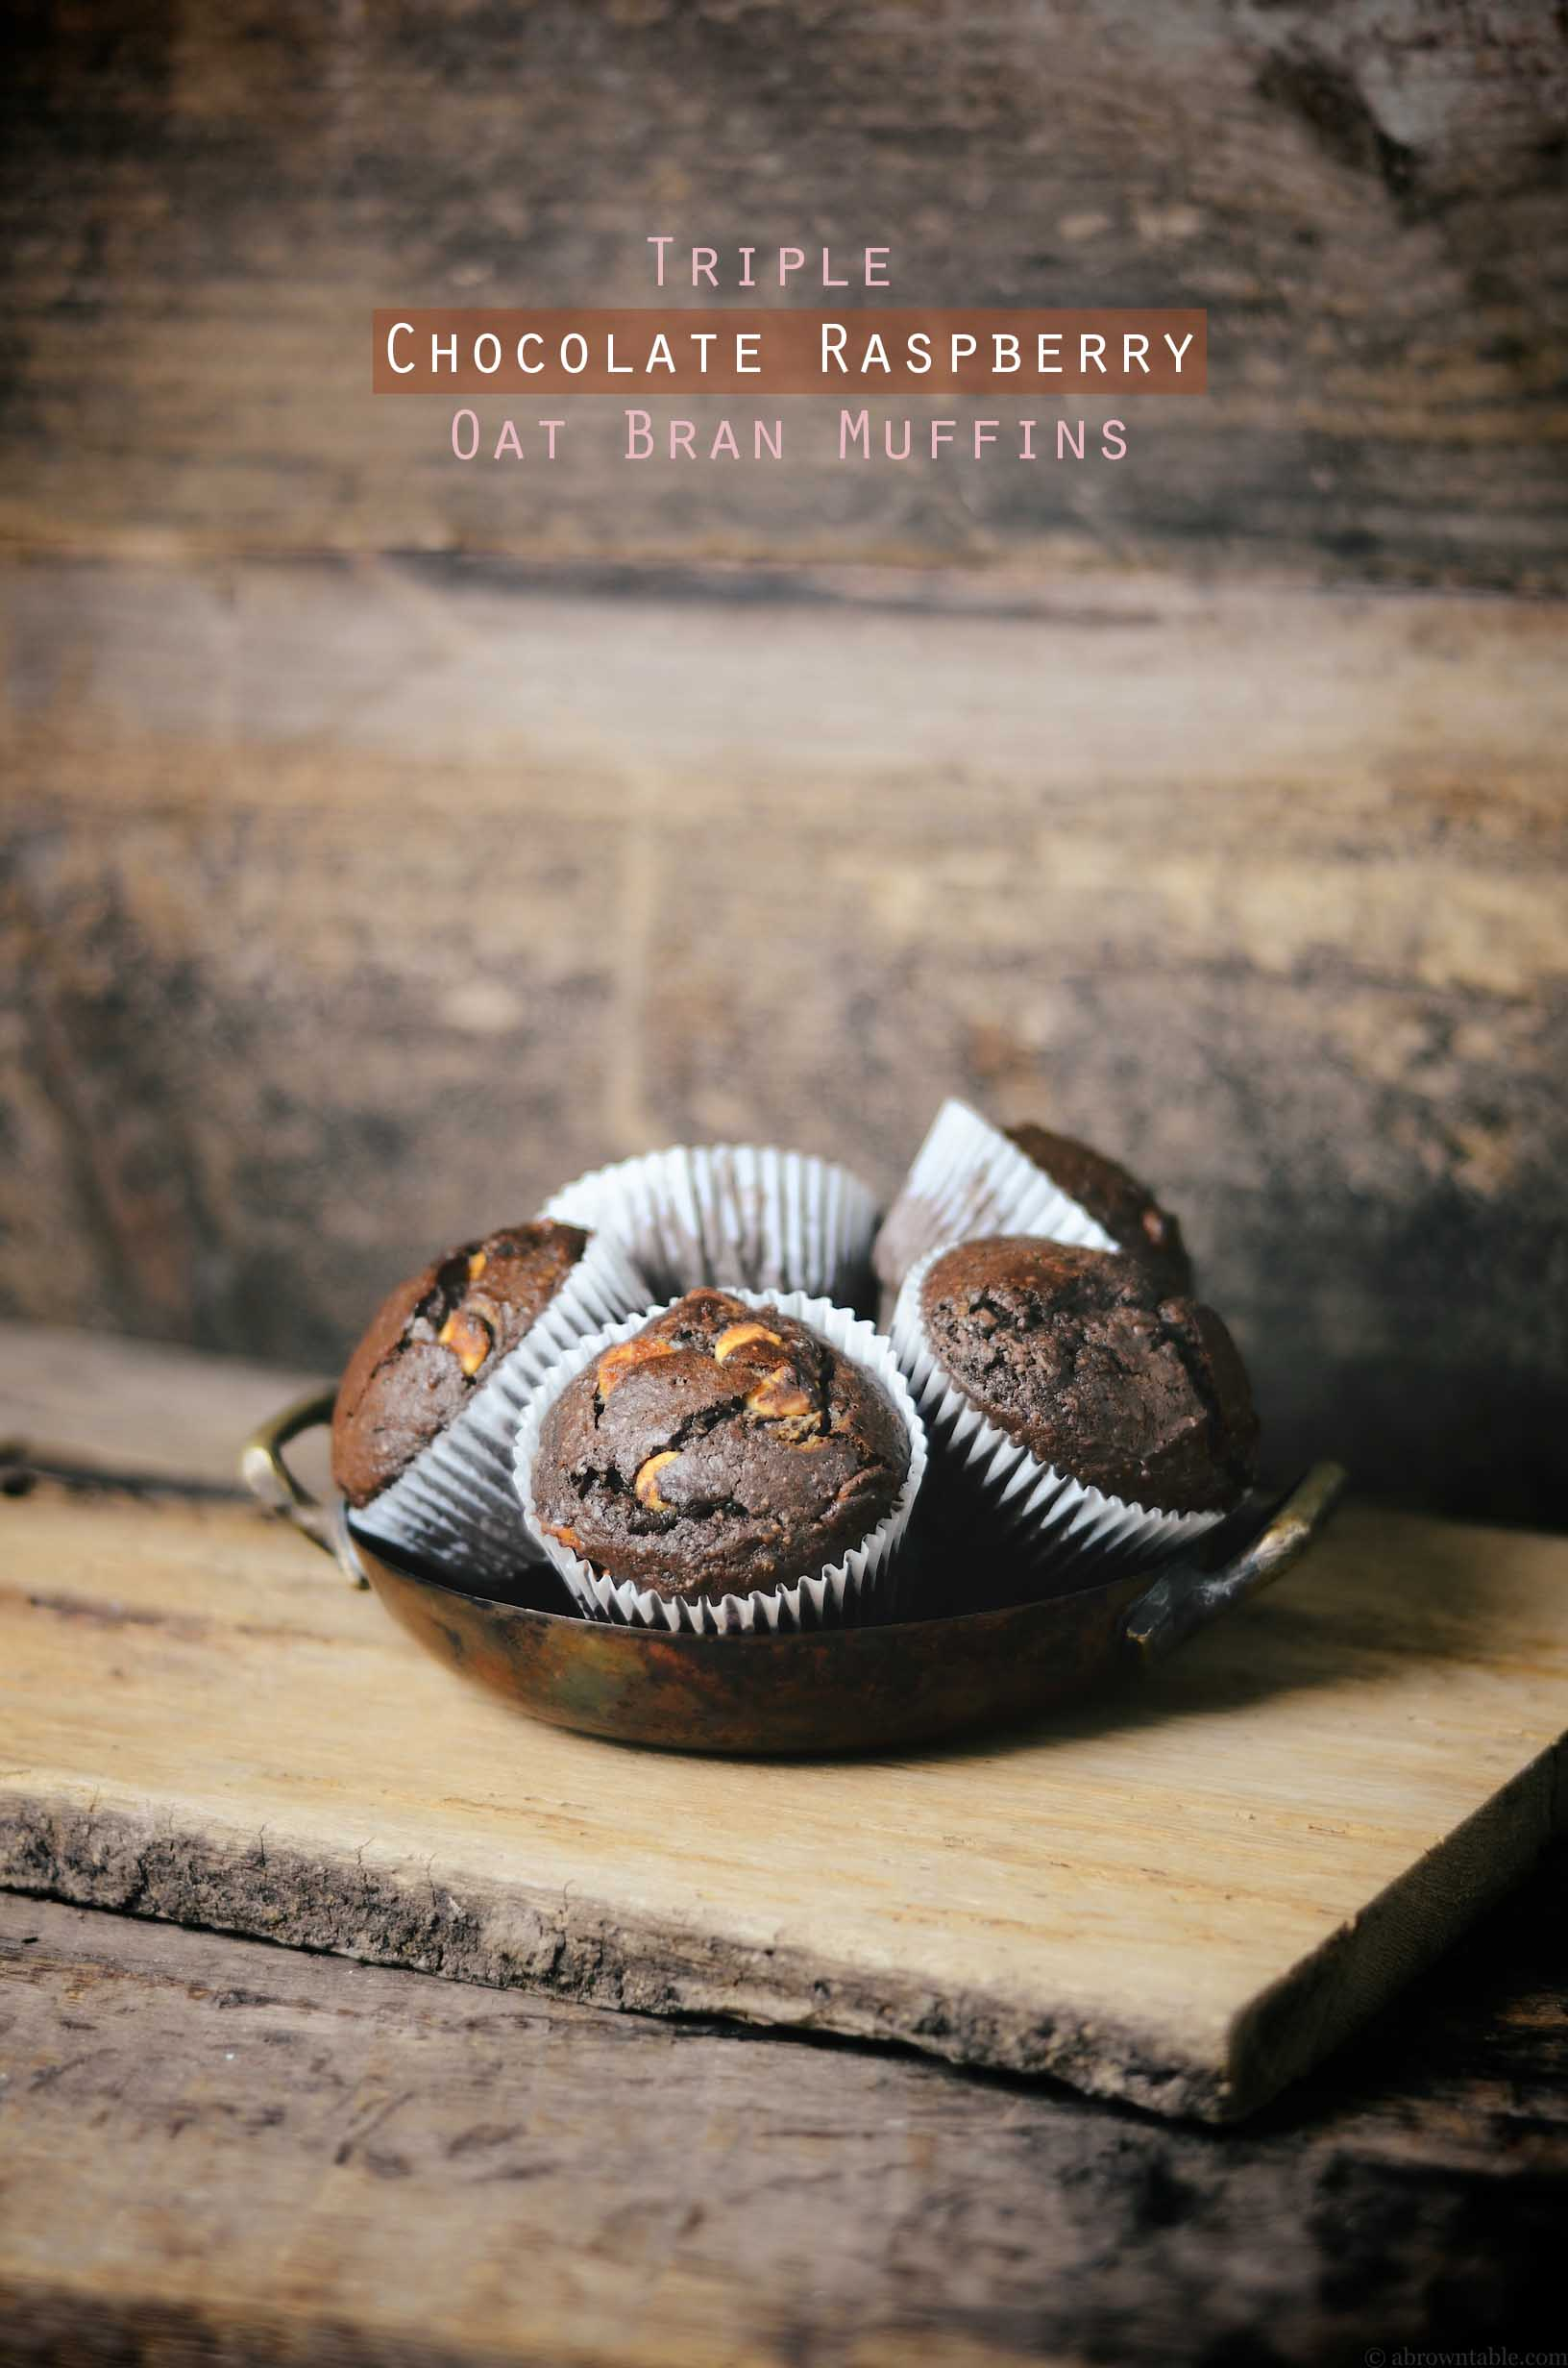 Triple Chocolate Raspberry Muffins